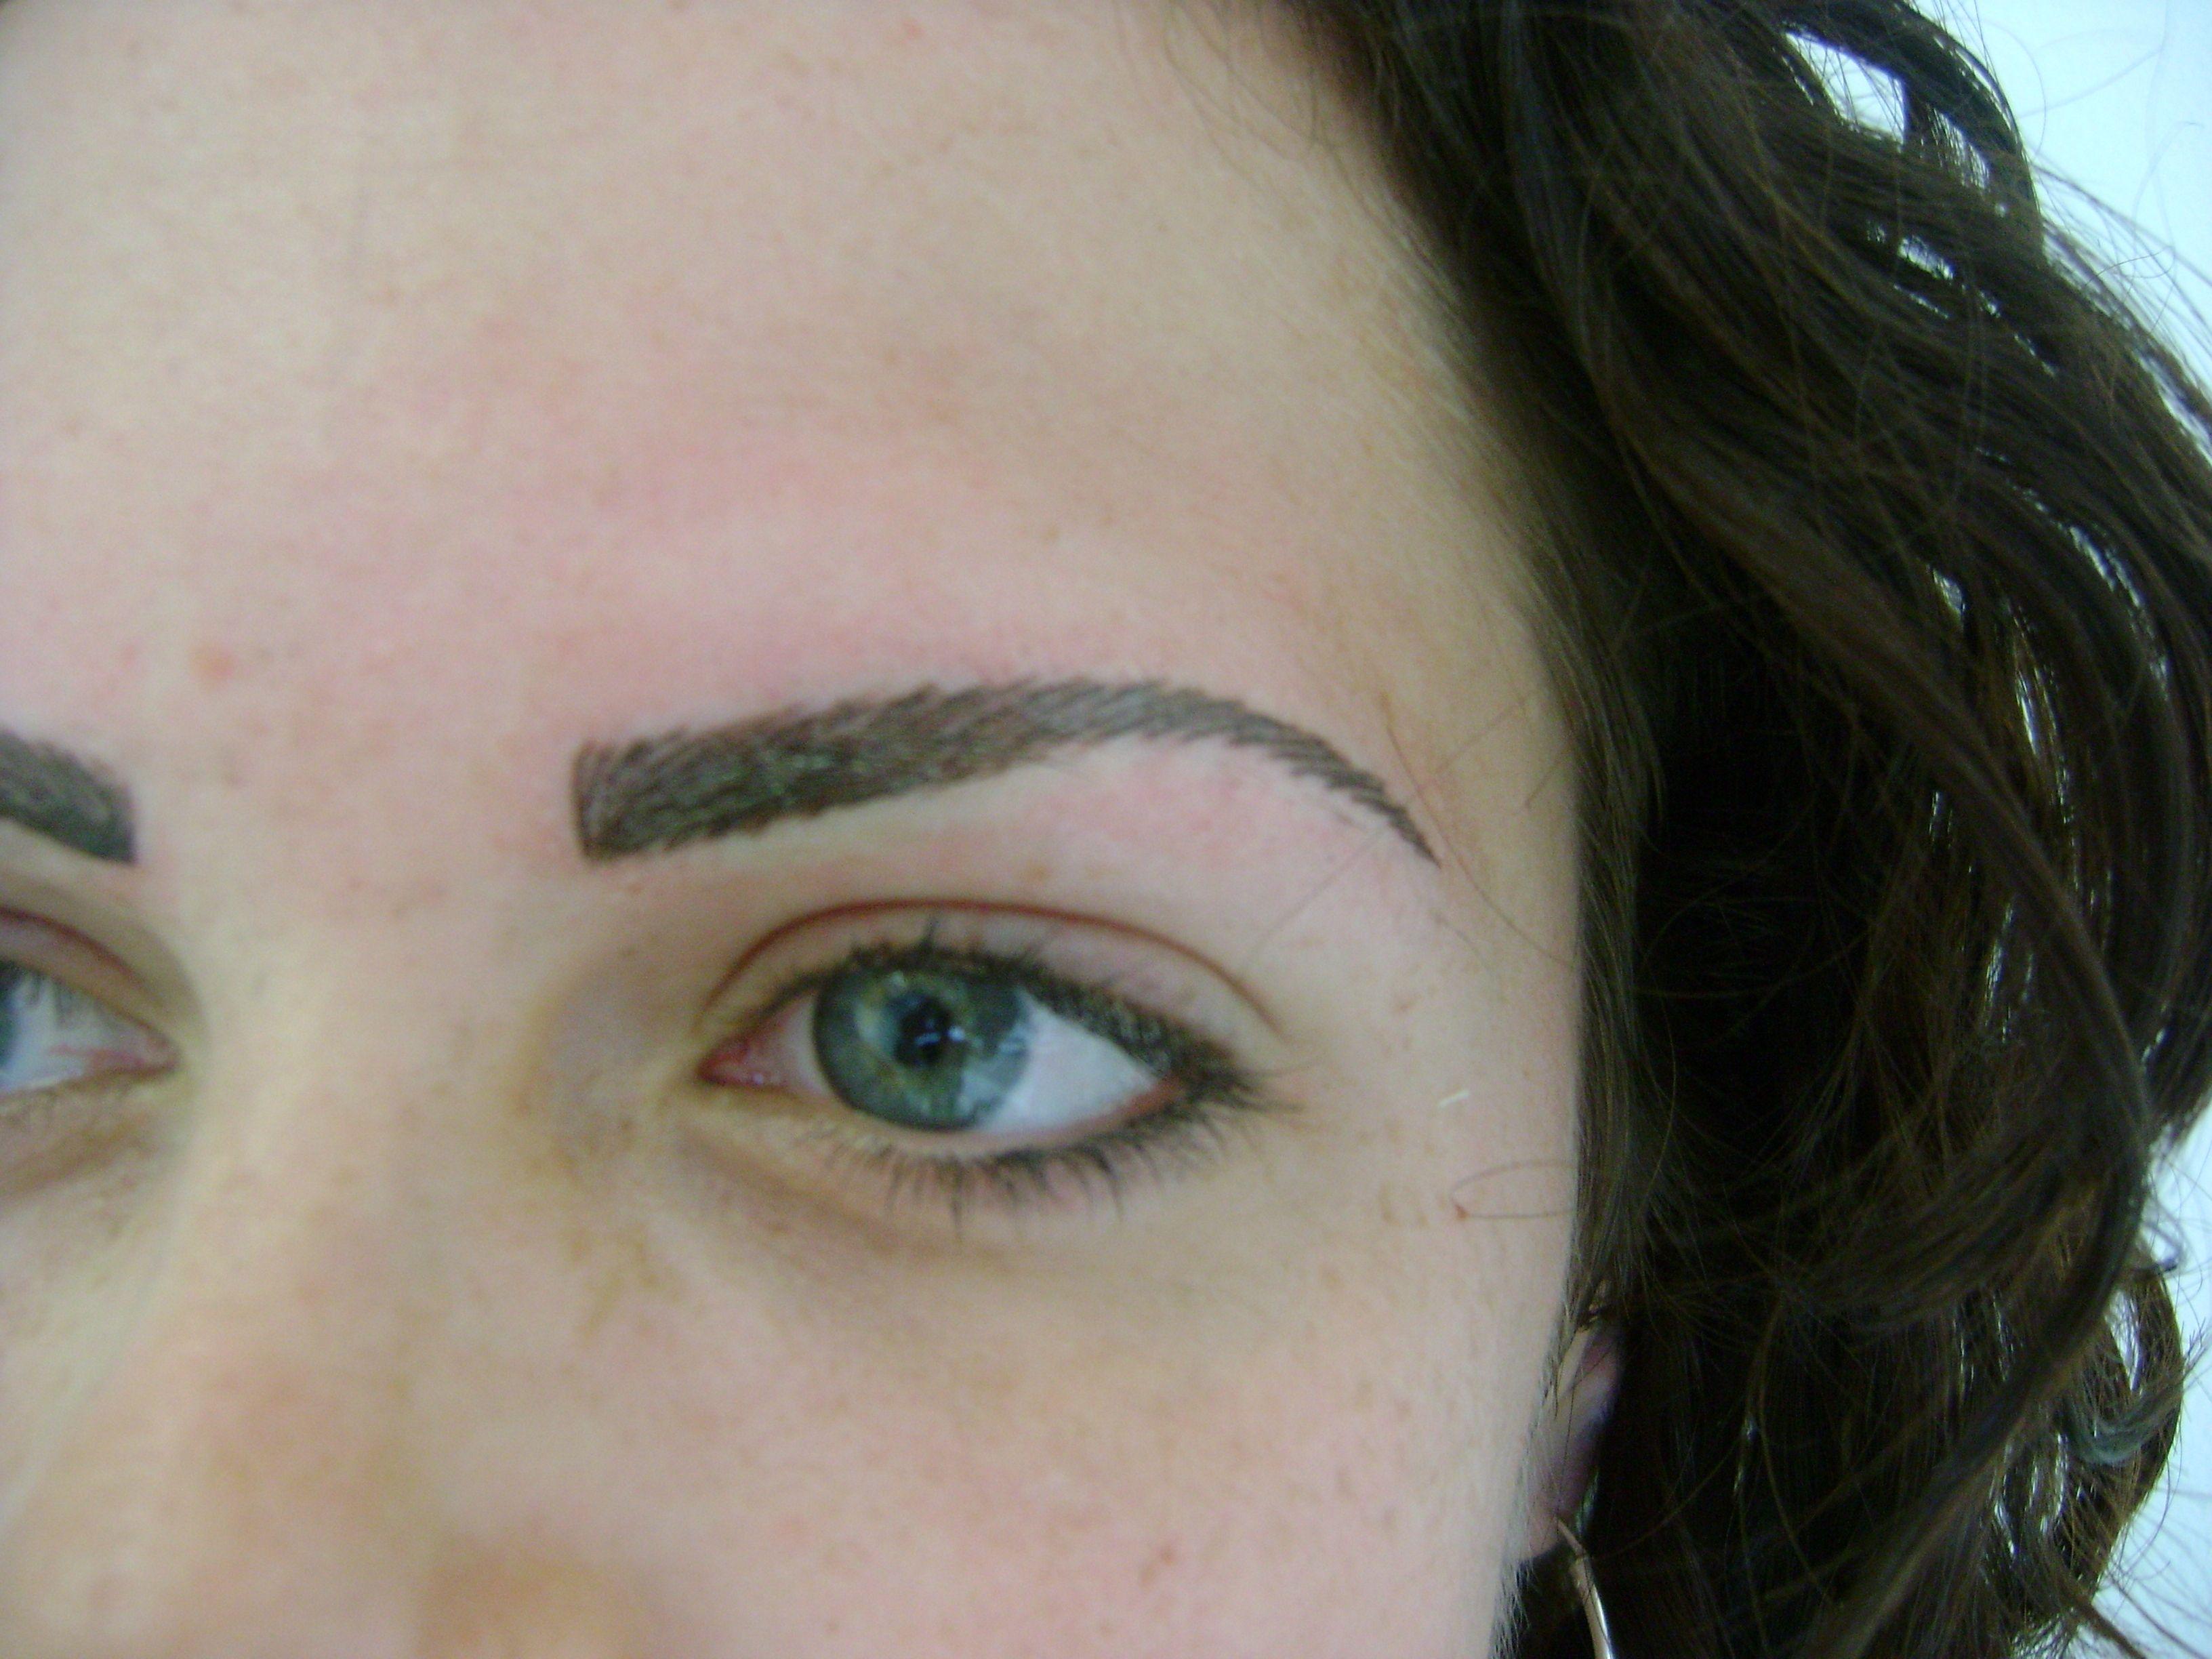 Eyebrow tattoo bad eyebrow tattoo bad eyebrows eyebrow